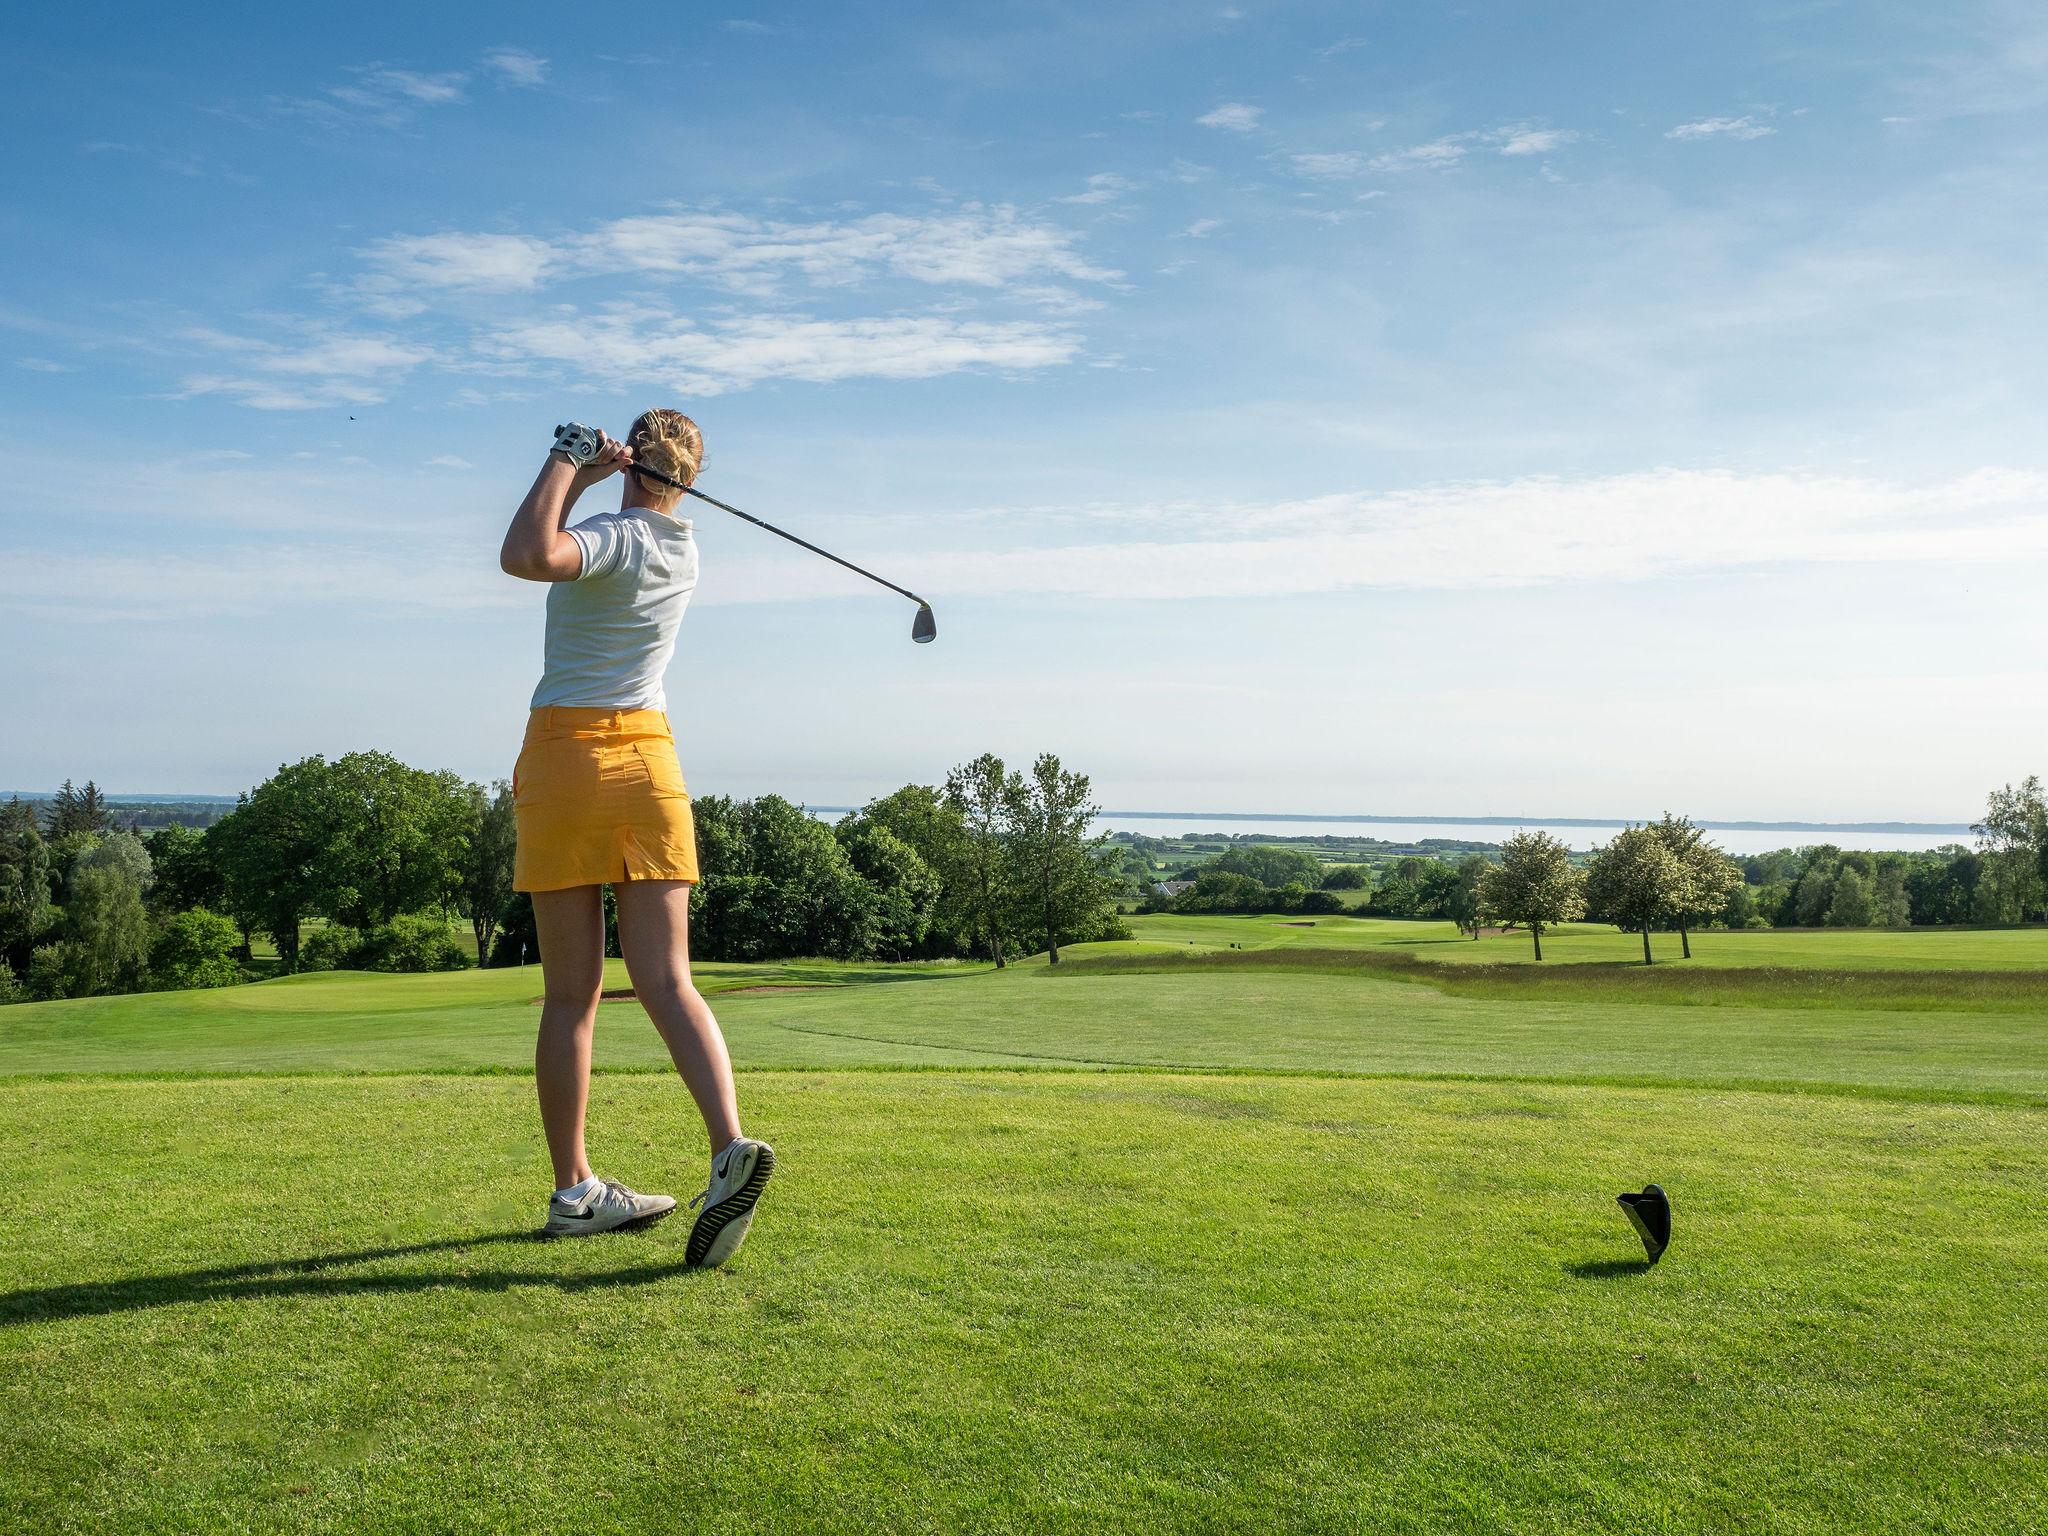 Åkagårdens Golfklubb, Båstad & Bjärehalvön